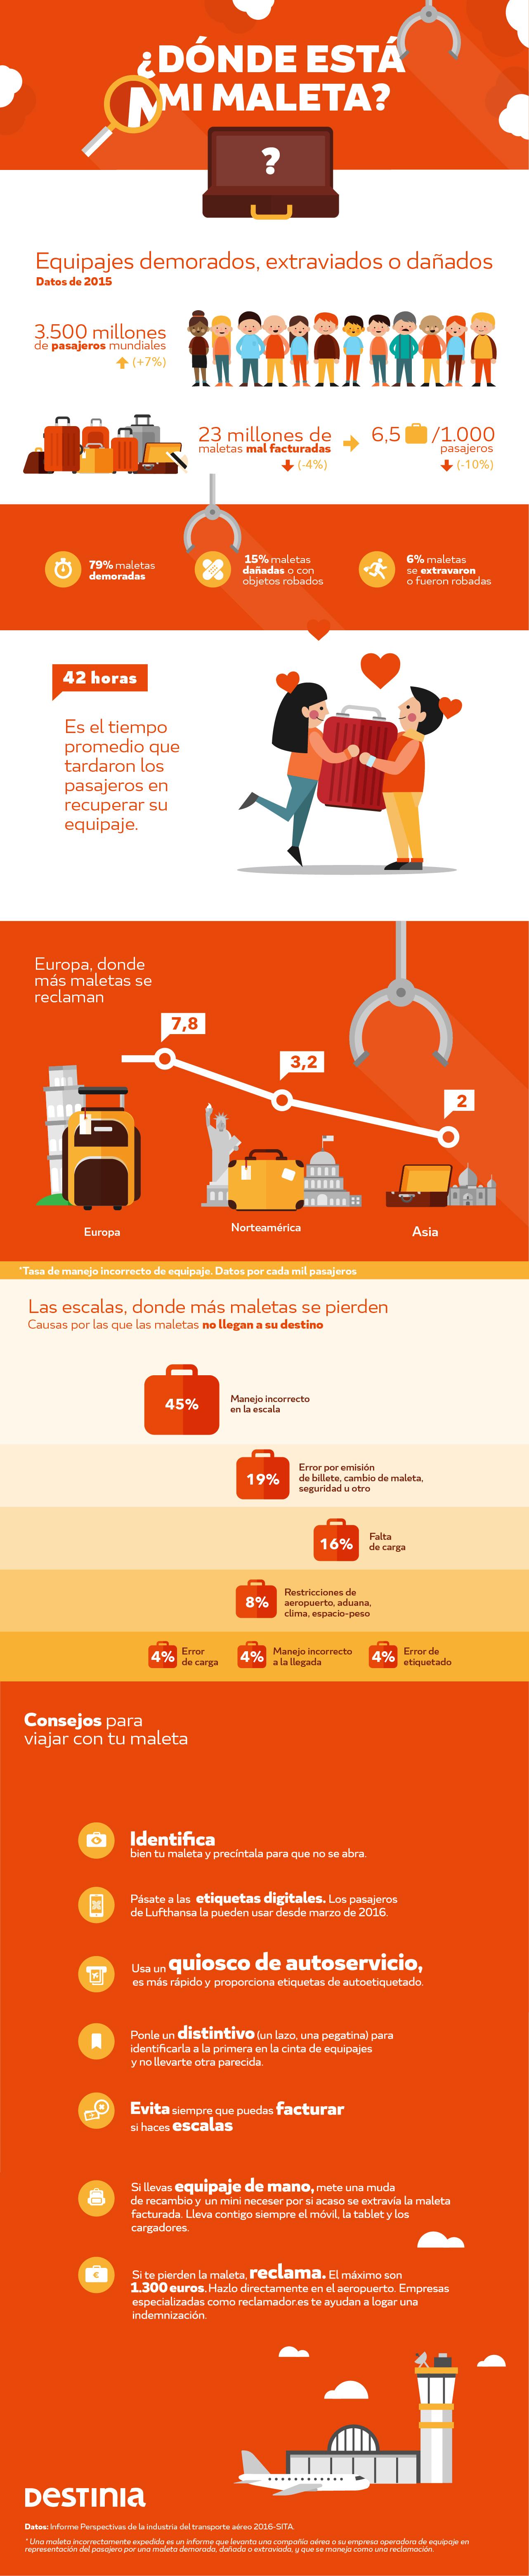 Infografia-Destinia-donde-esta-mi-maleta-72_20160628